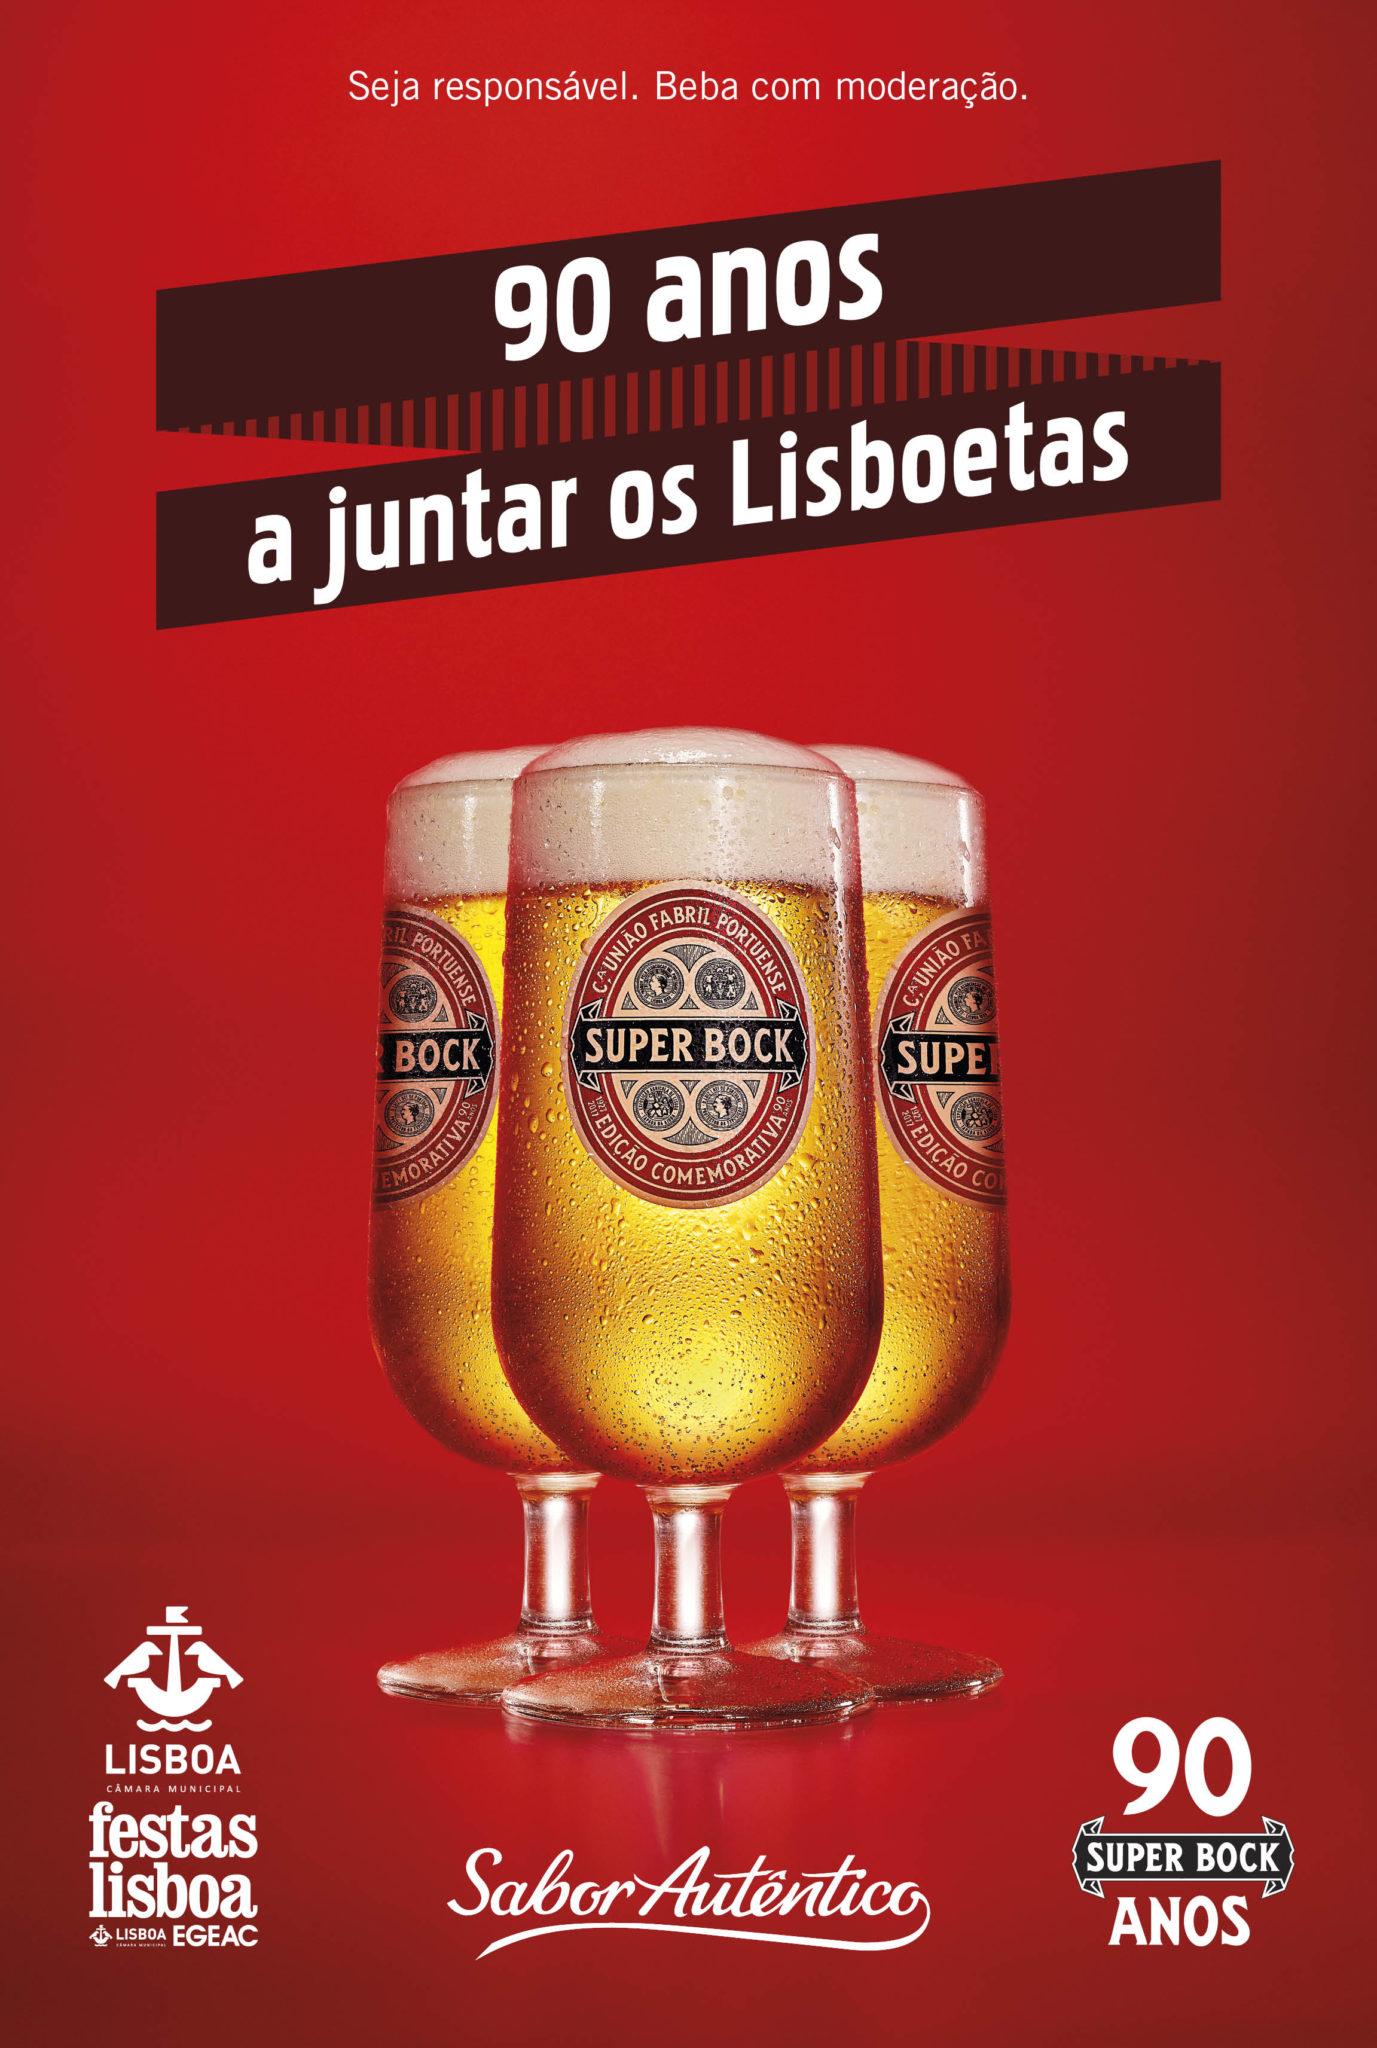 Super Bock Festas de Lisboa 2017 - 1